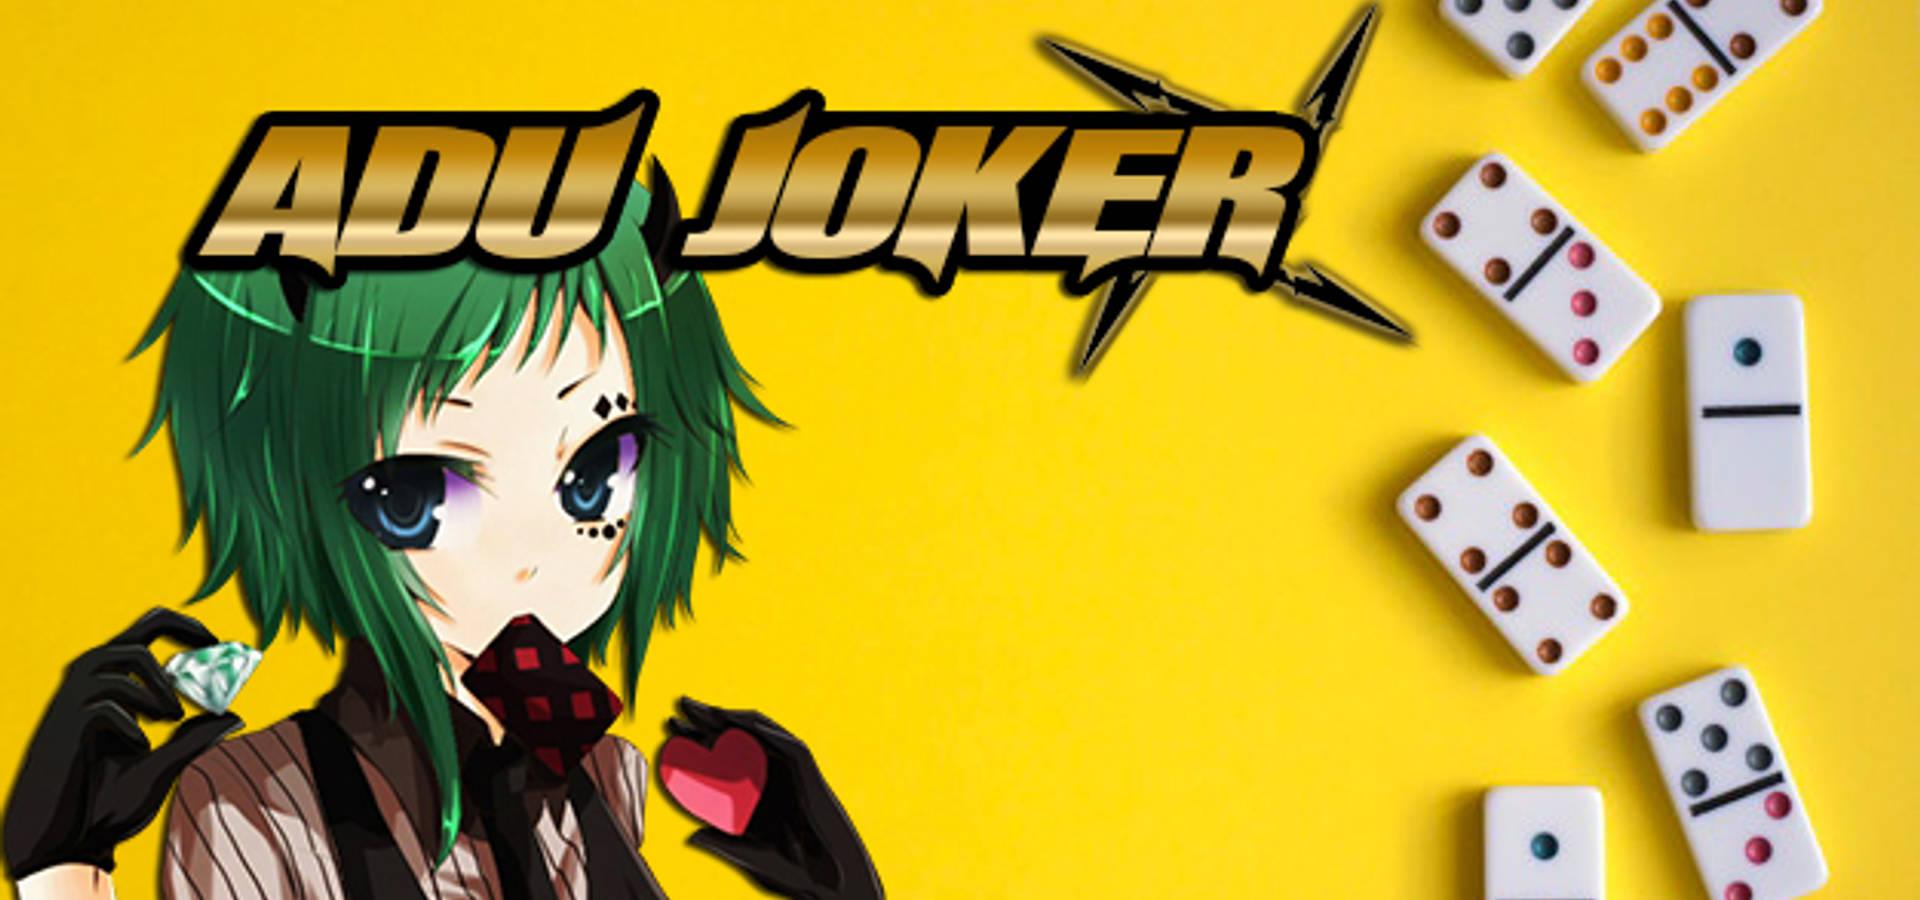 Adujoker Domino Online Domino Terpercaya Domino Ceme Domino Poker Domino Terbaik Domino 99 Domino Qq Judi Domino Homify